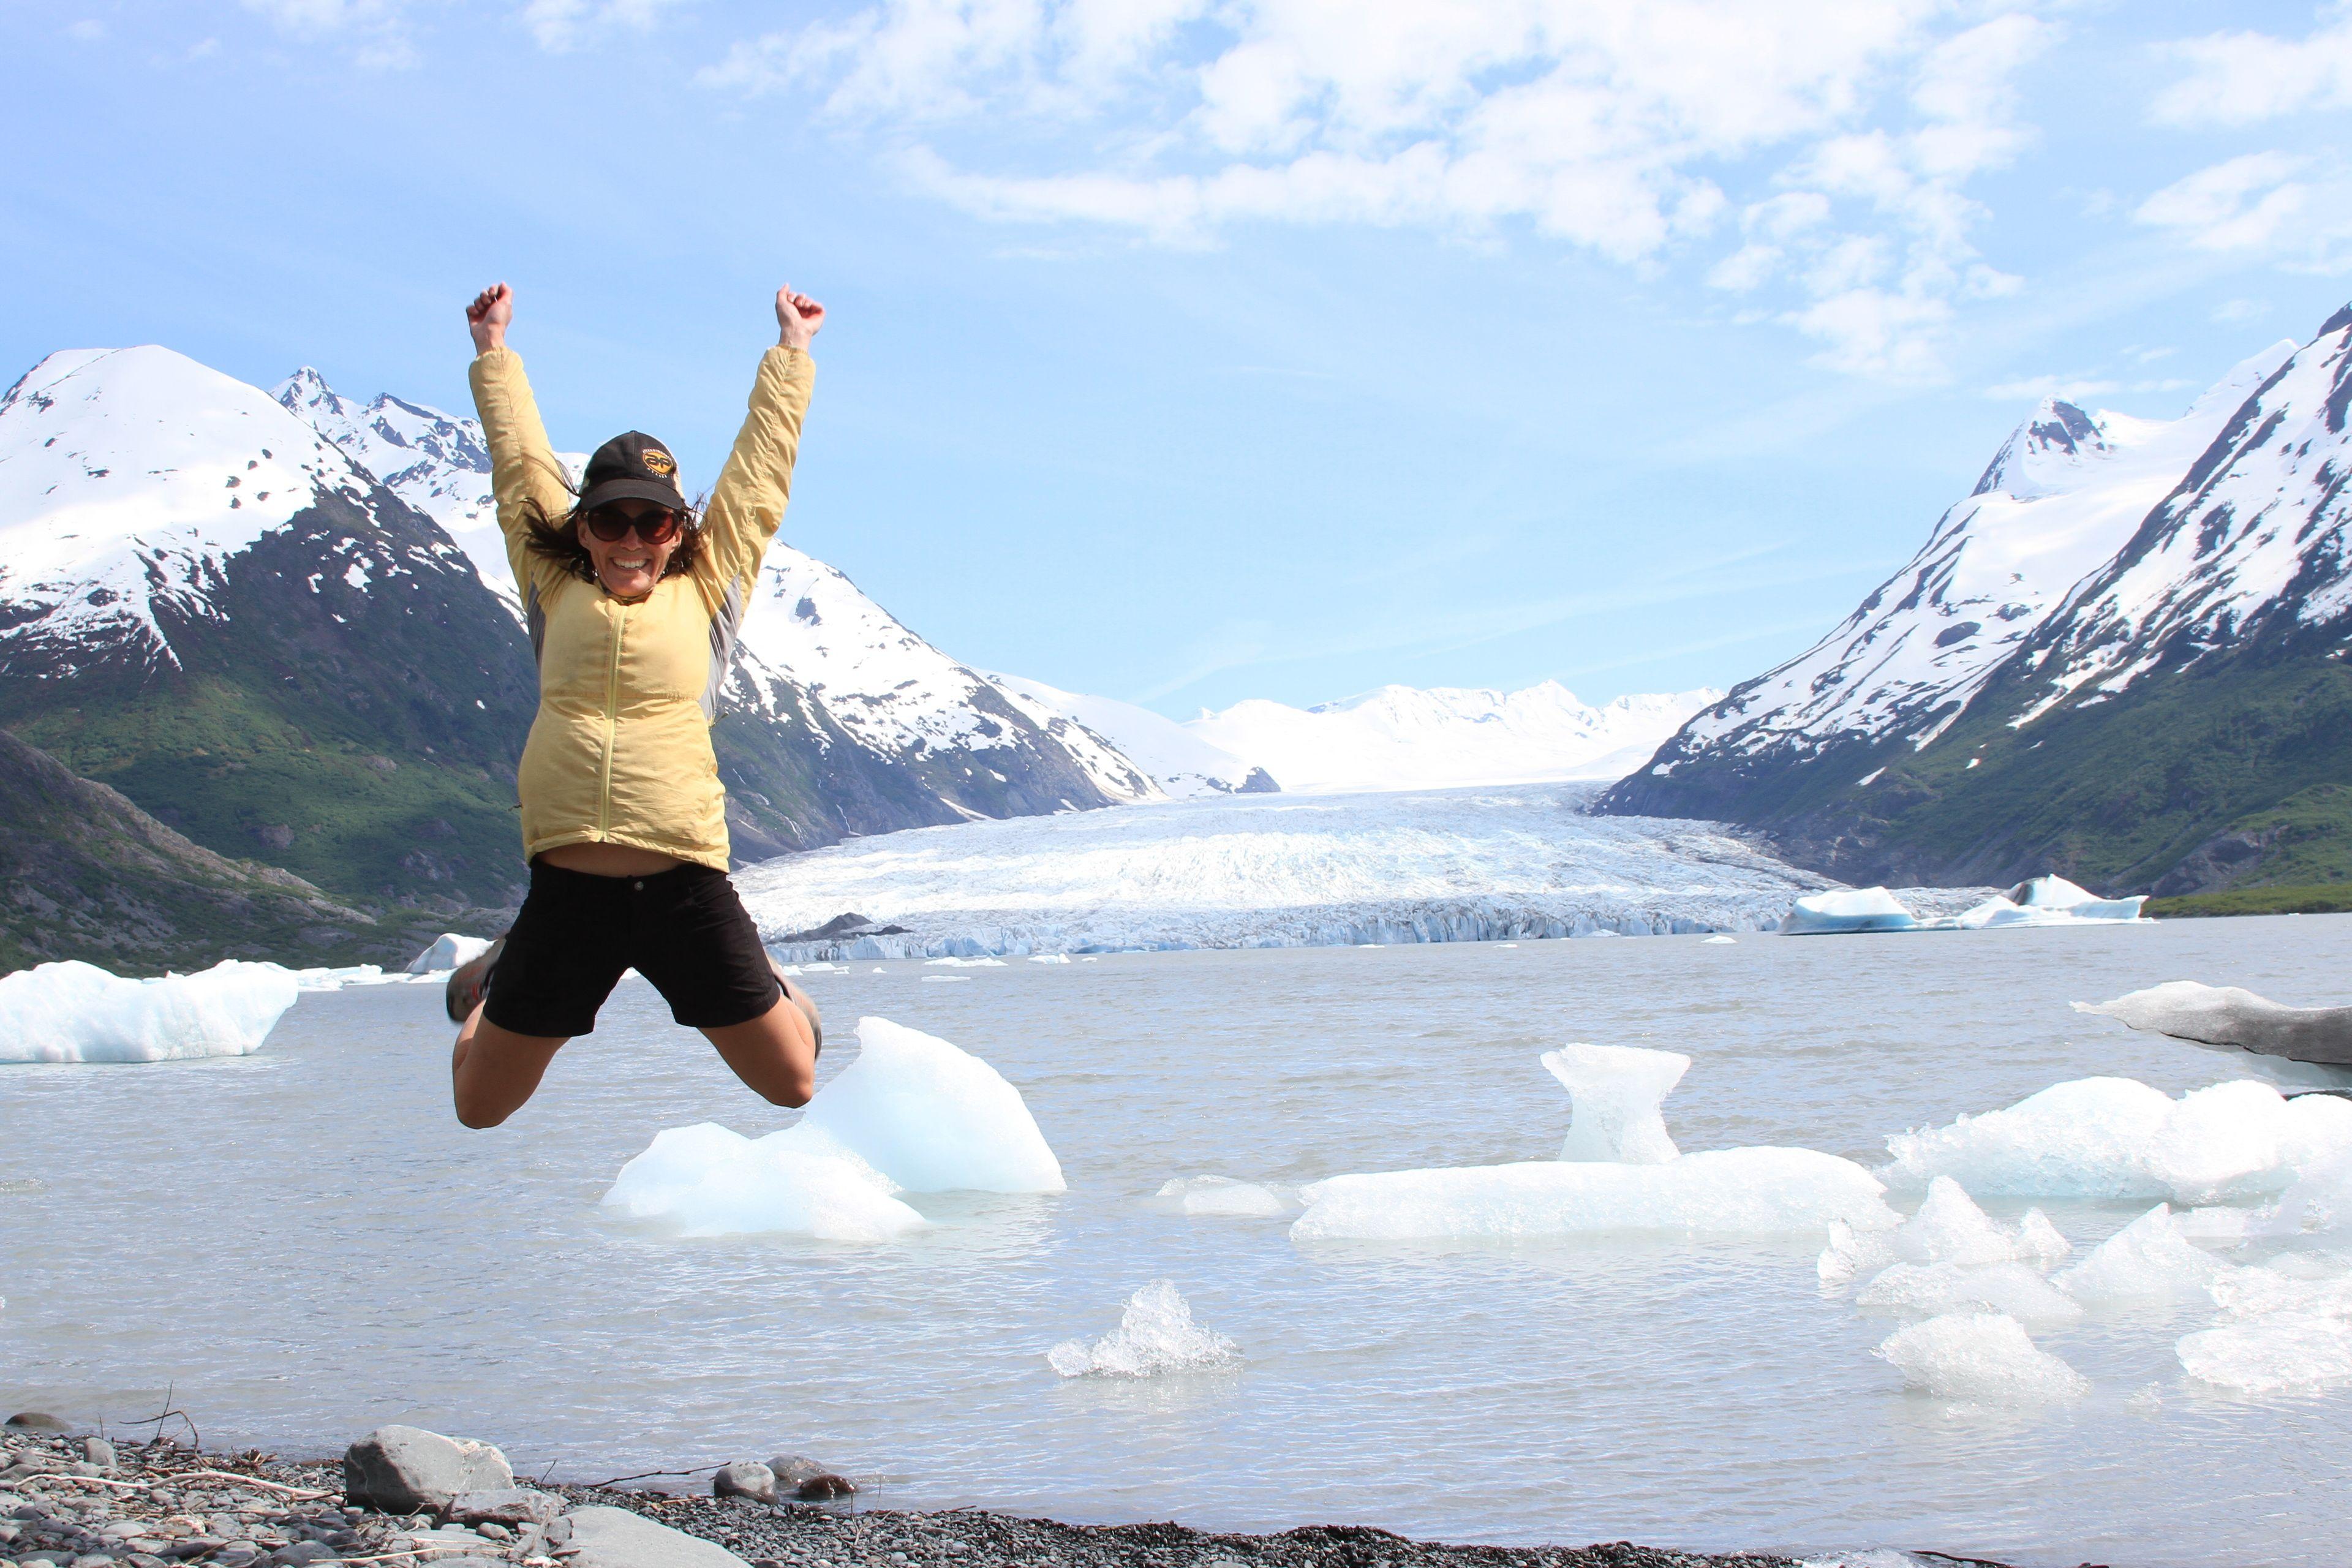 Spencer Iceberg & Glacier Viewing Hike & Scenic Train Ride